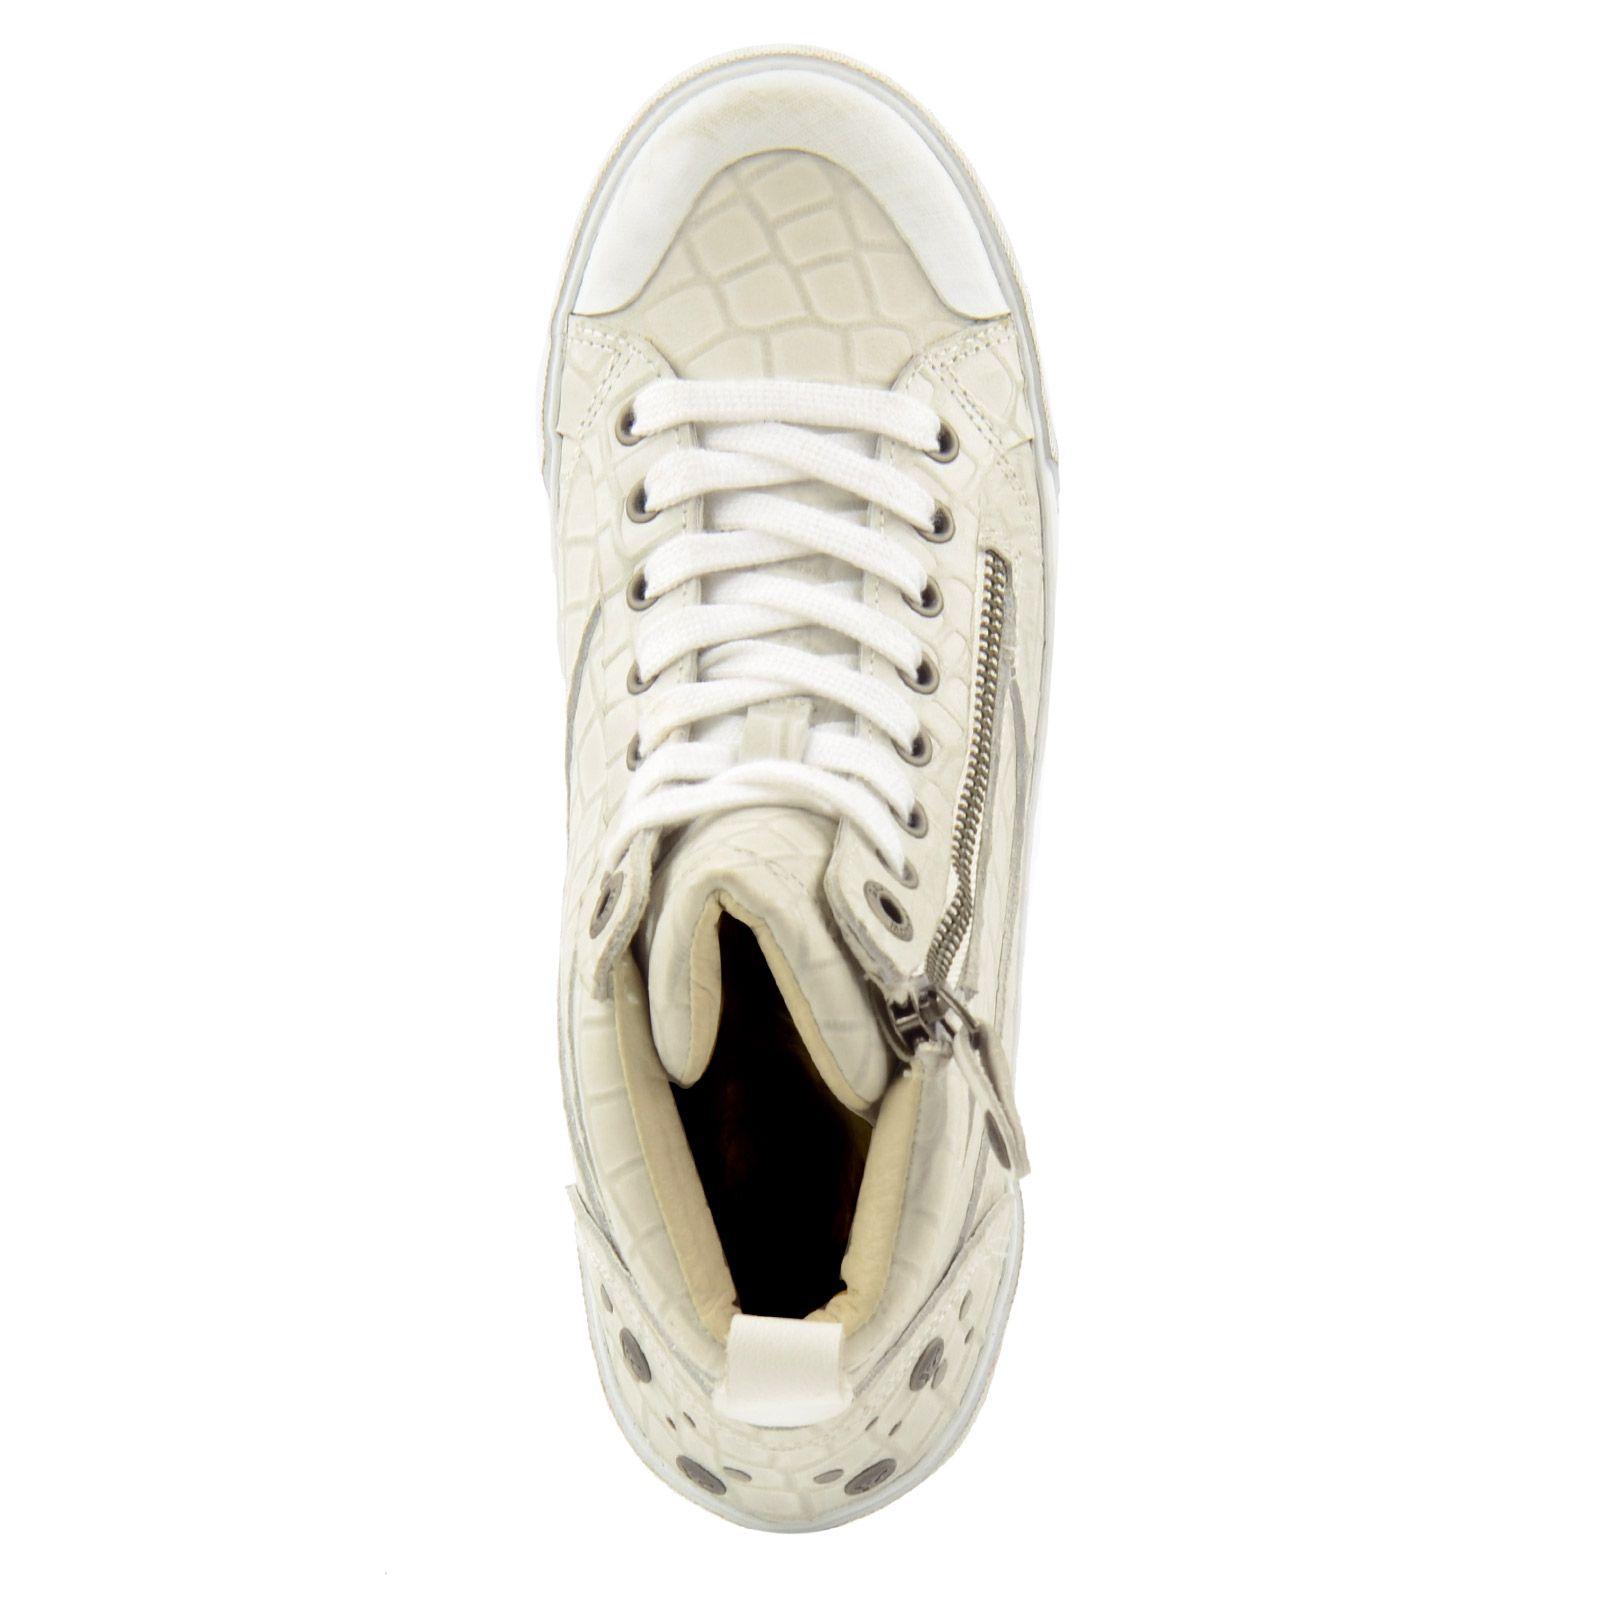 Hohe Sneaker Yellow Cab